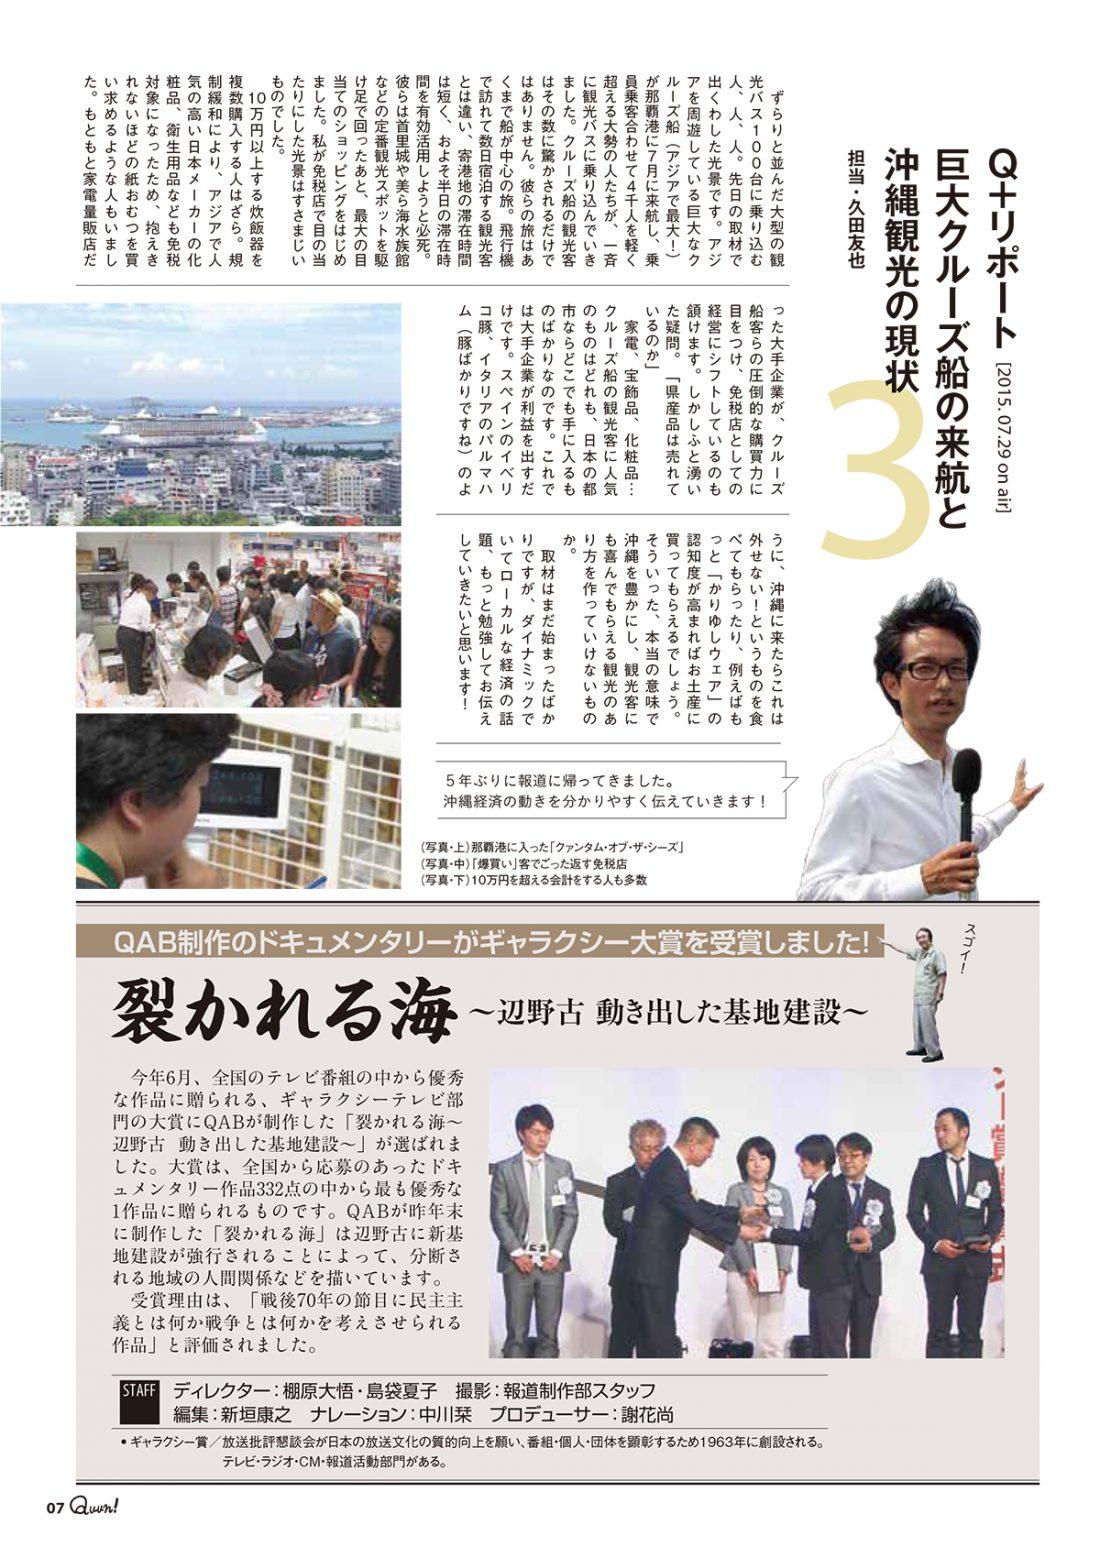 http://www.qab.co.jp/qgoro/wp-content/uploads/quun_0409-1100x1558.jpg